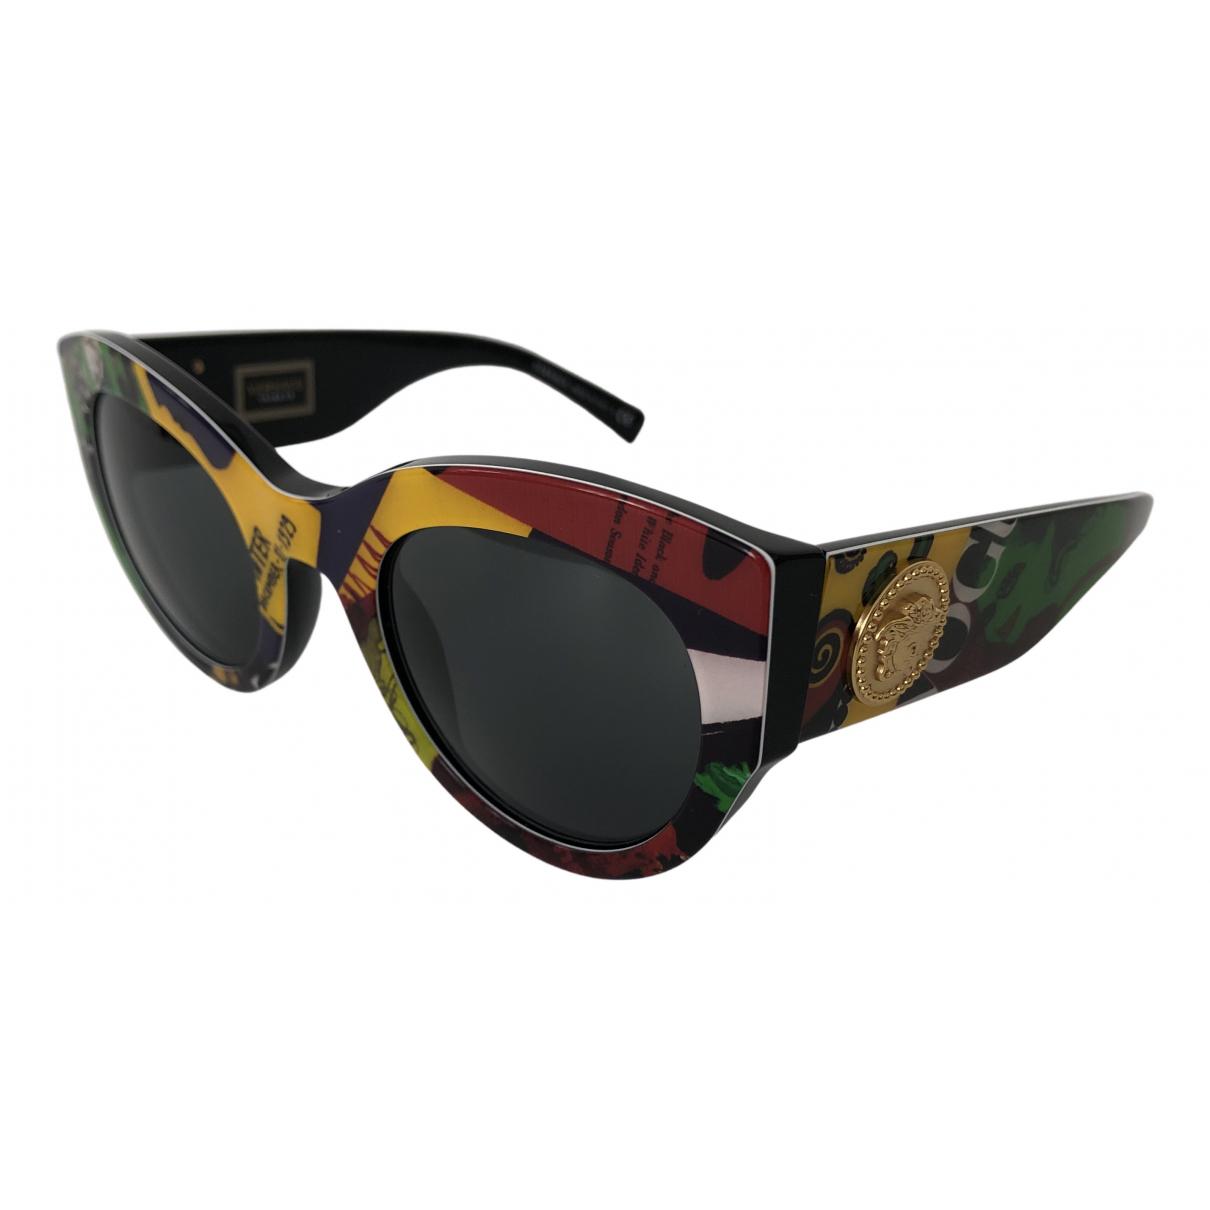 Versace N Multicolour Sunglasses for Women N